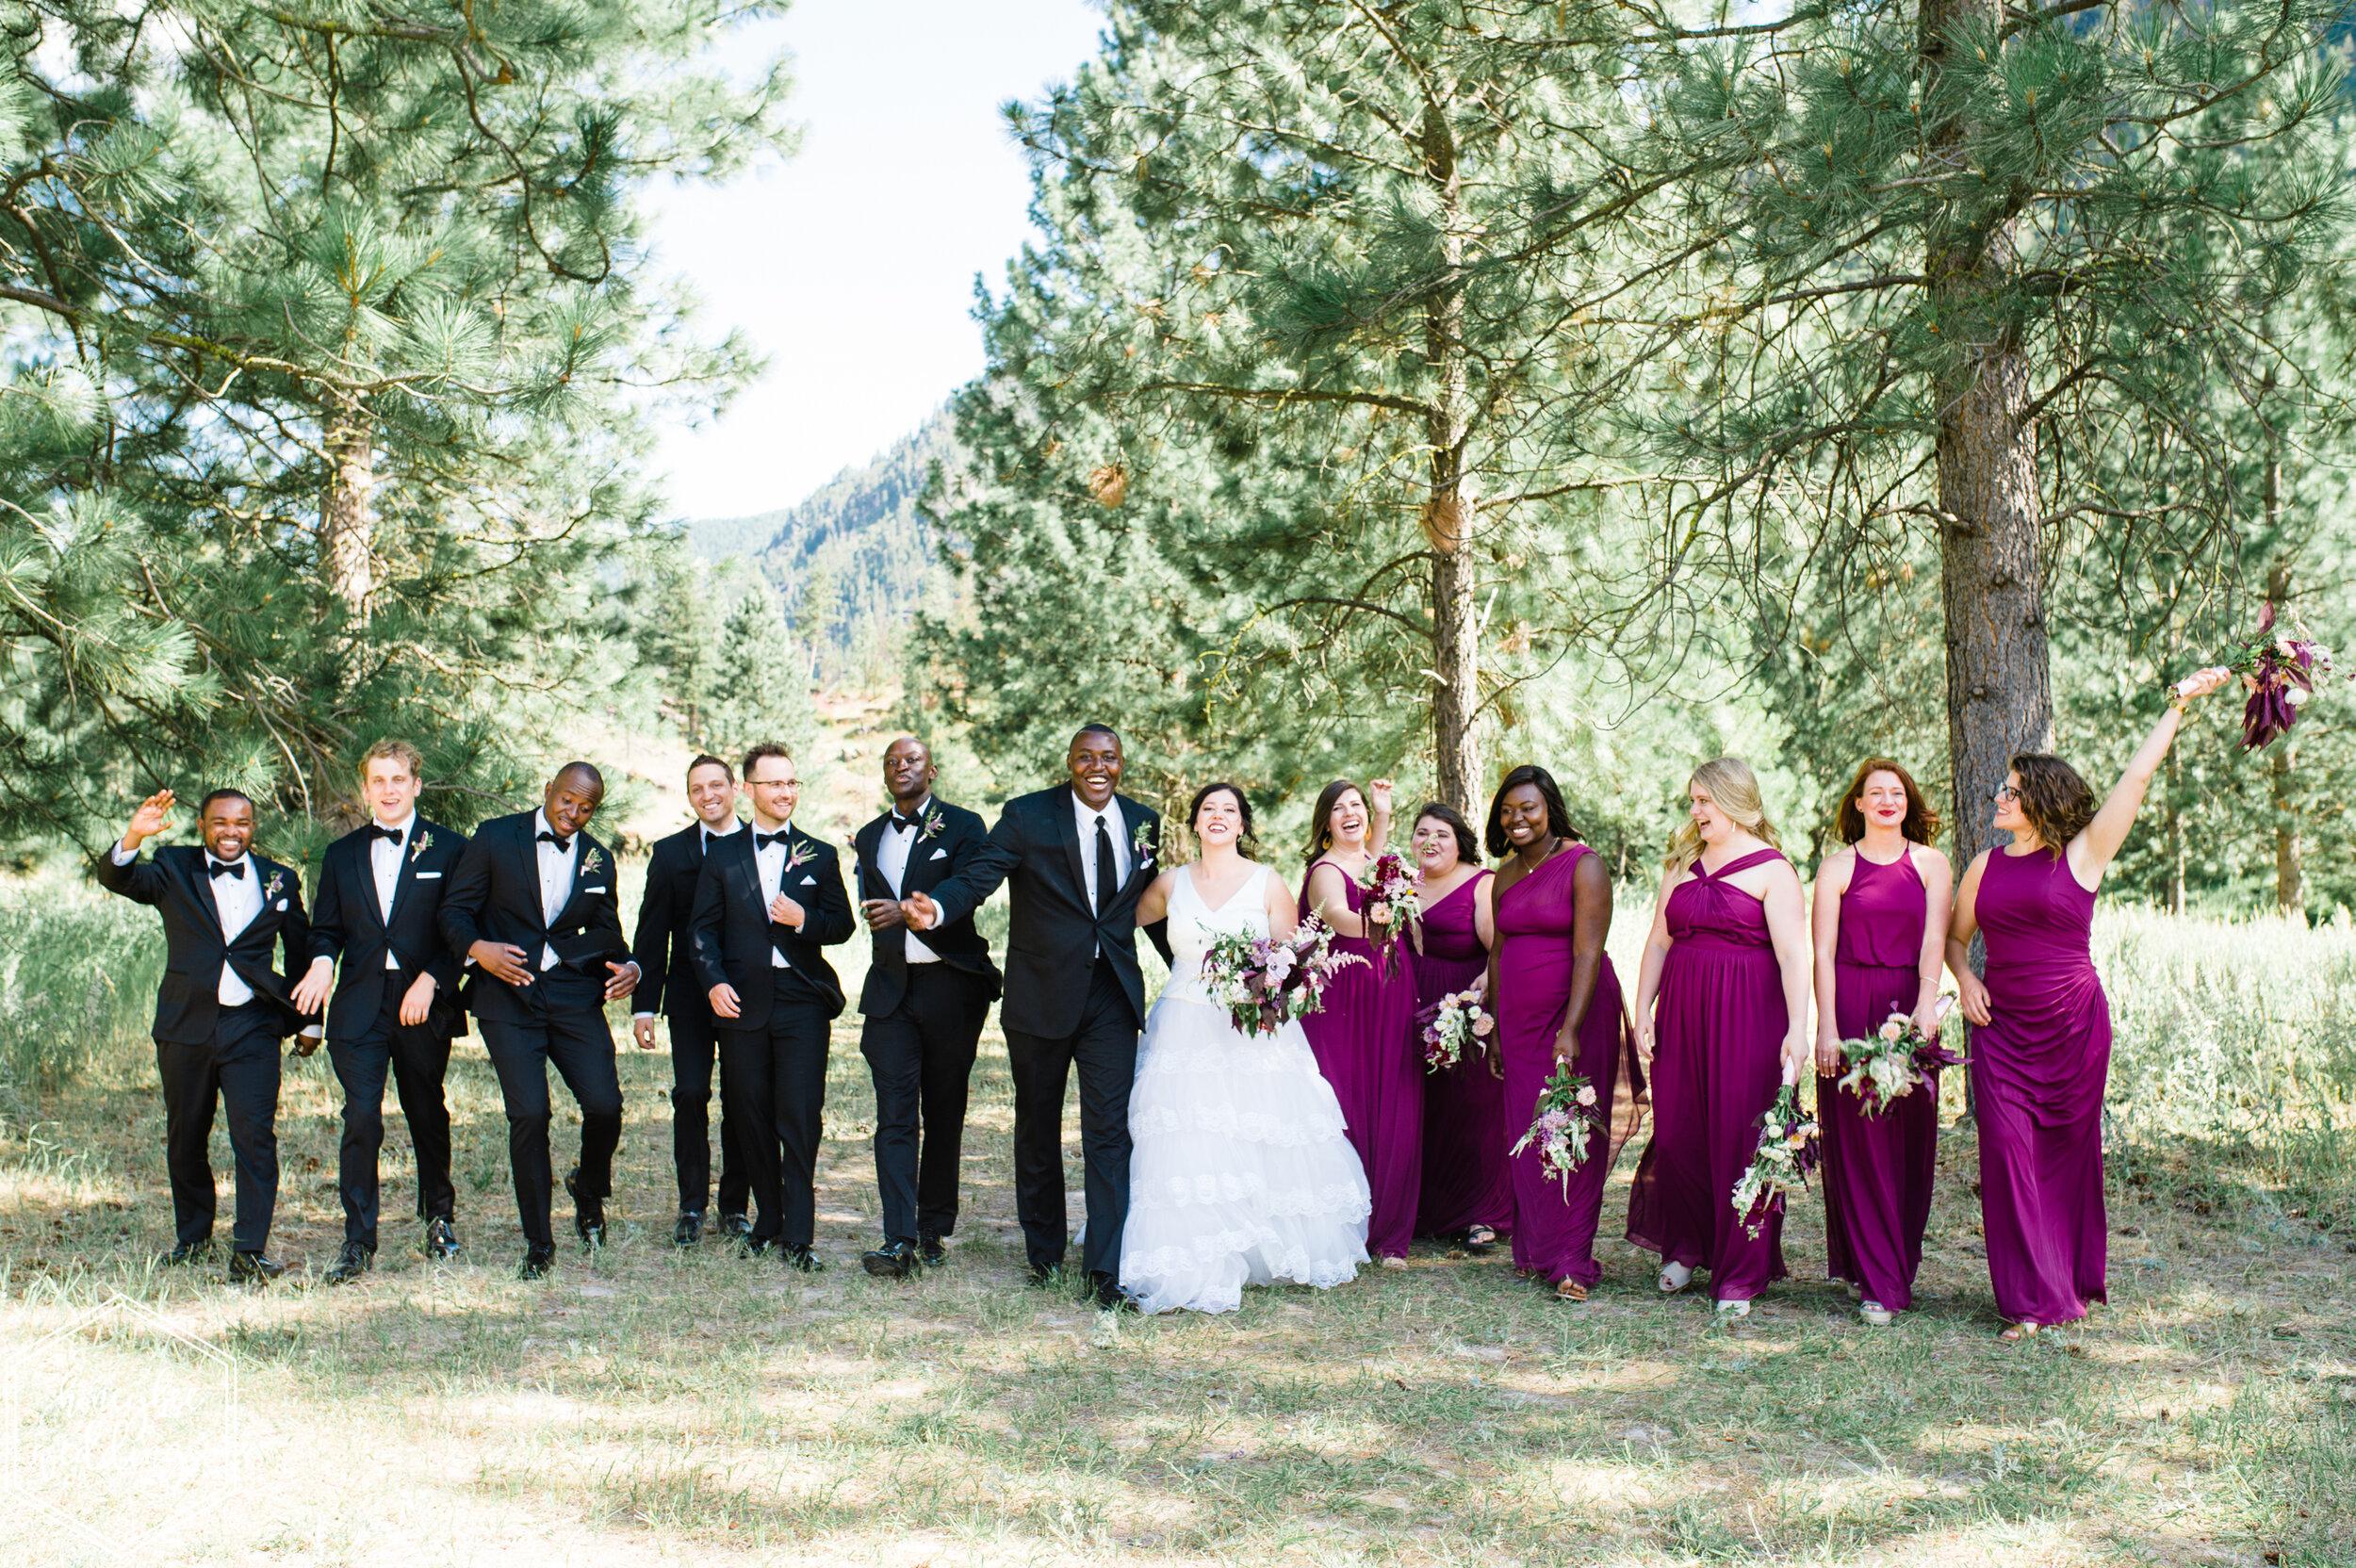 080White Raven Wedding_Montana Wedding Photographer_Rebekah & Likom_Honeybee Weddings_July 27, 2019-909.jpg